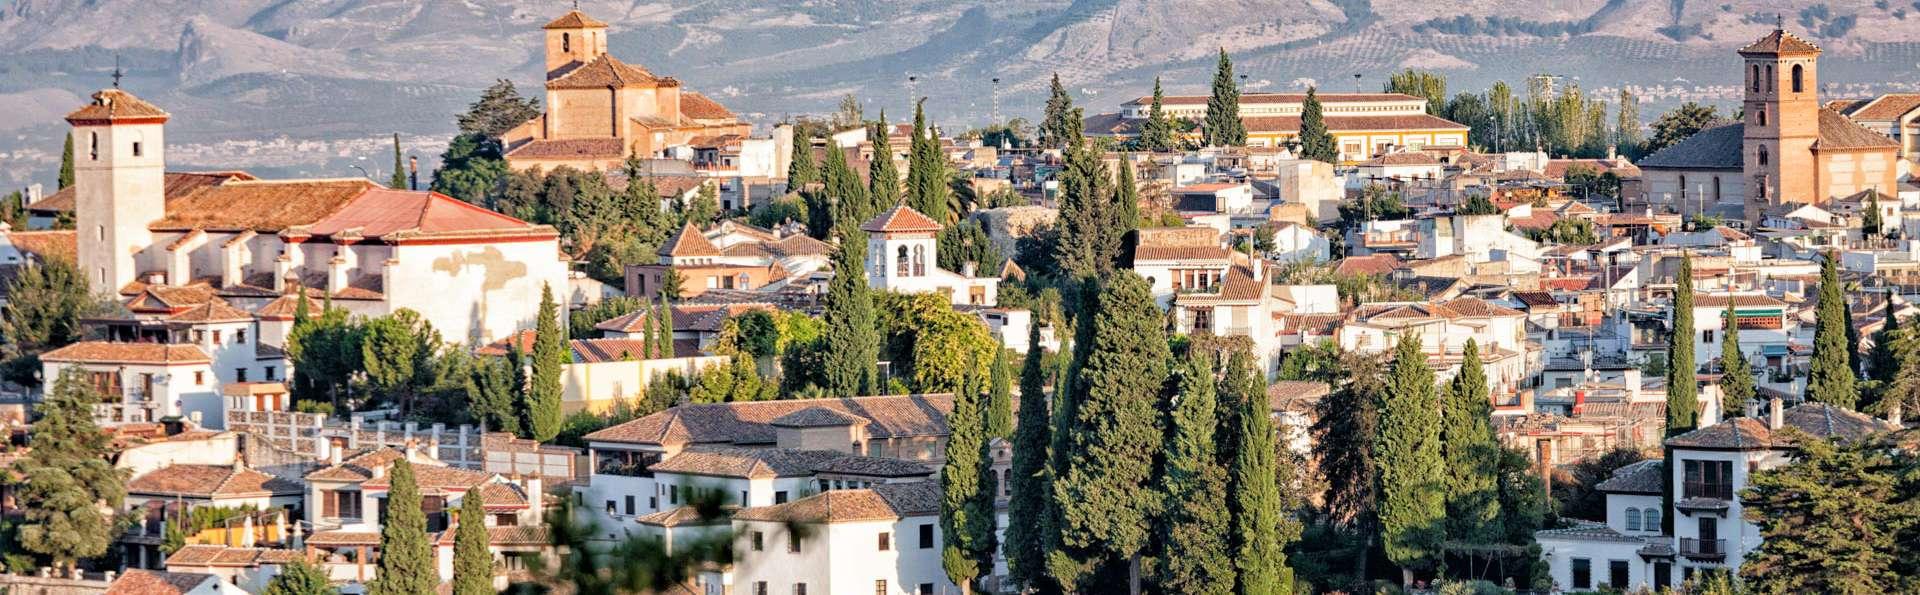 Nest Flats Granada - EDIT_DESTINATION_01.jpg